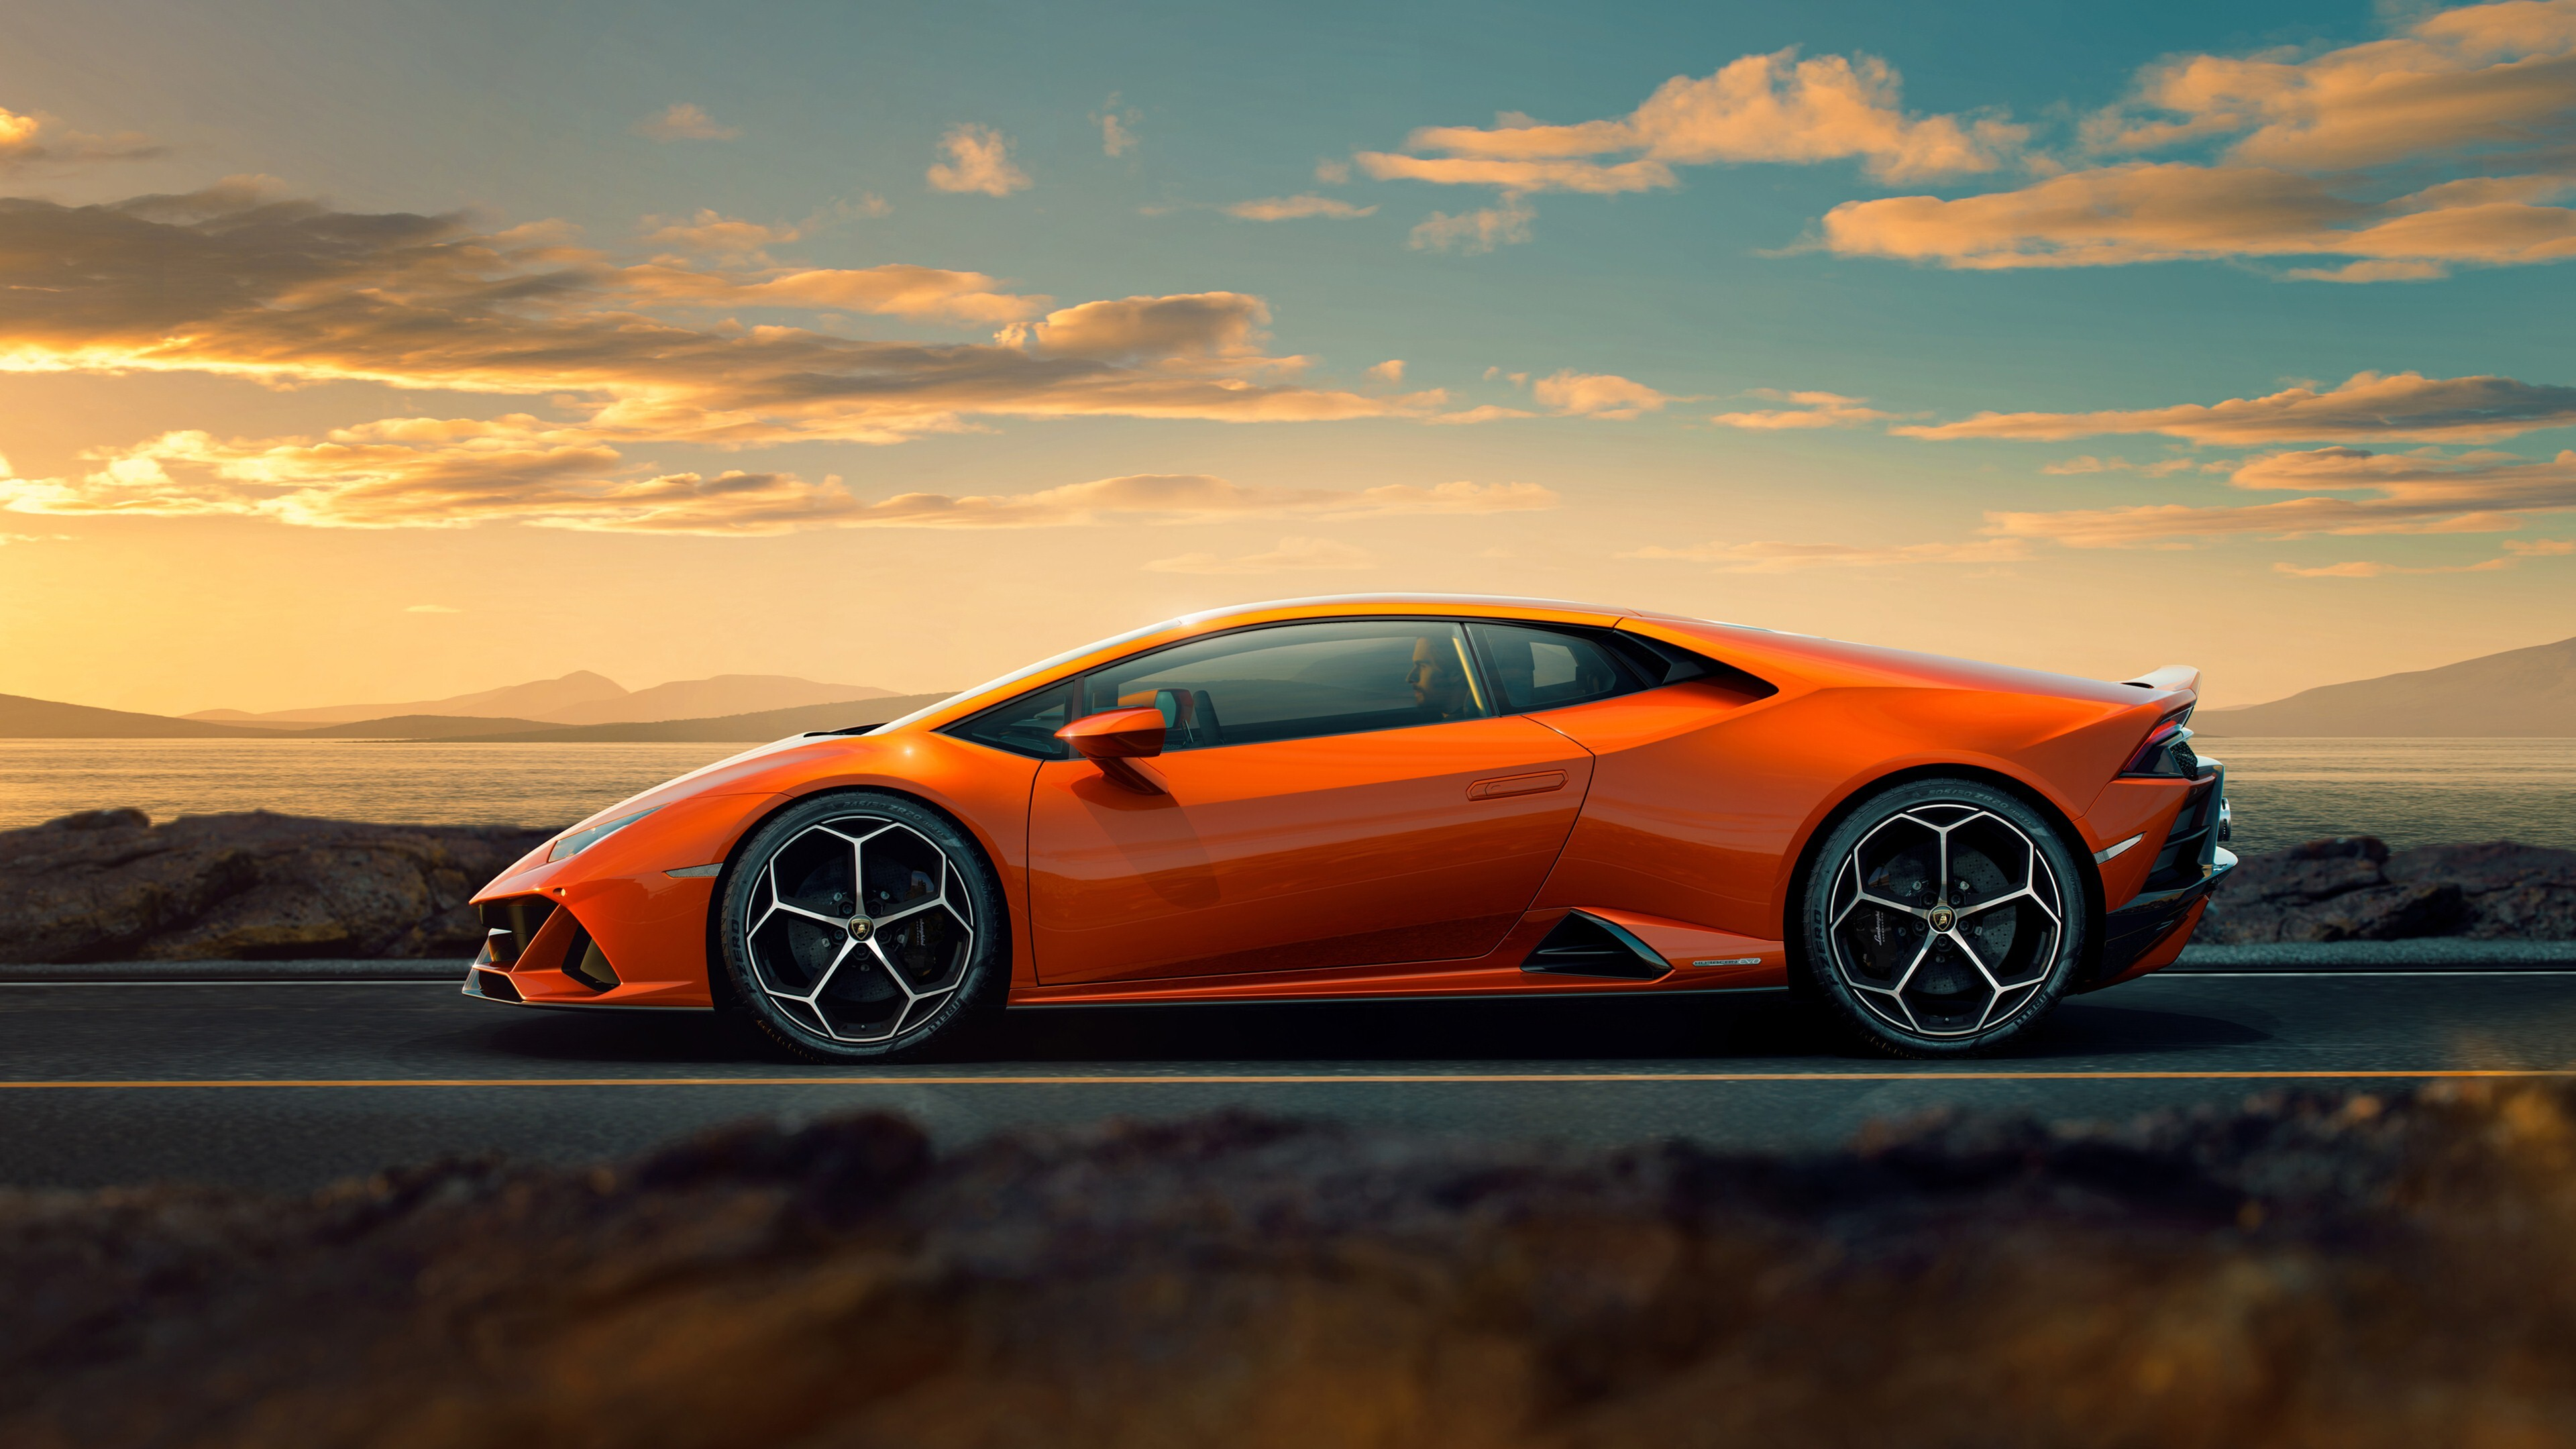 4K Photo of 2019 Lamborghini Huracan EVO Car | HD Wallpapers